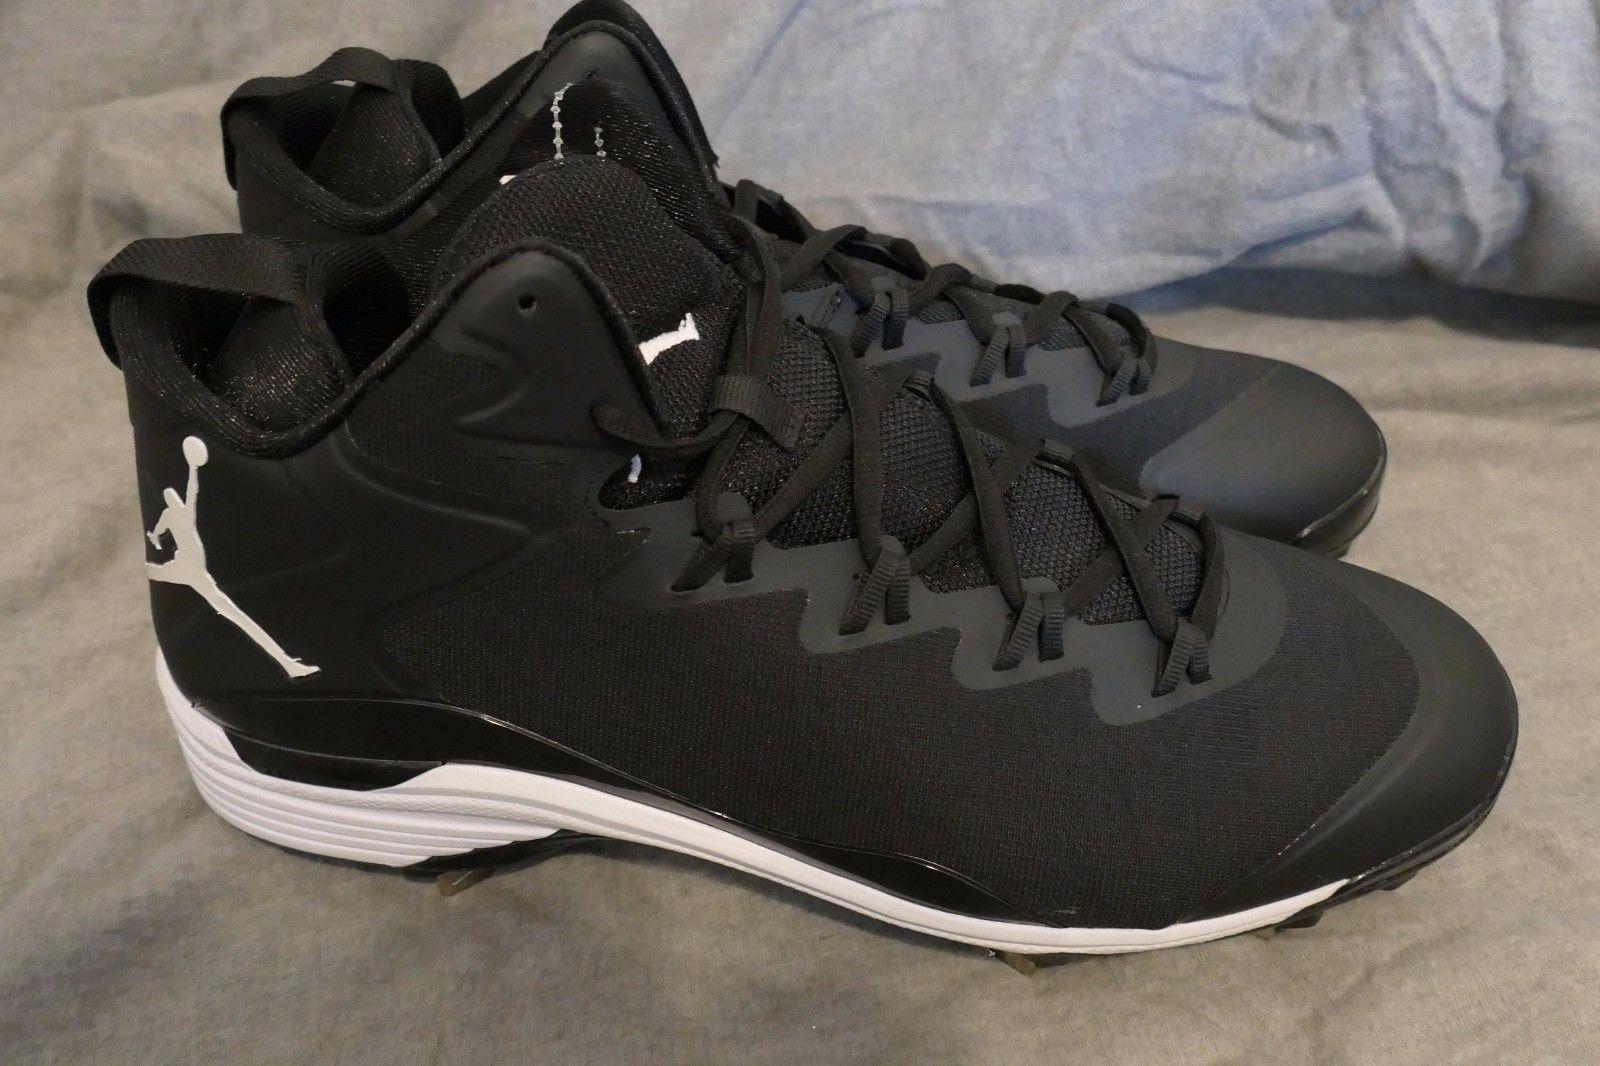 check out 67179 04f01 New Nike Air Jordan SuperFly 3 Metal Baseball Cleats 684941-010 Men s Sz 13